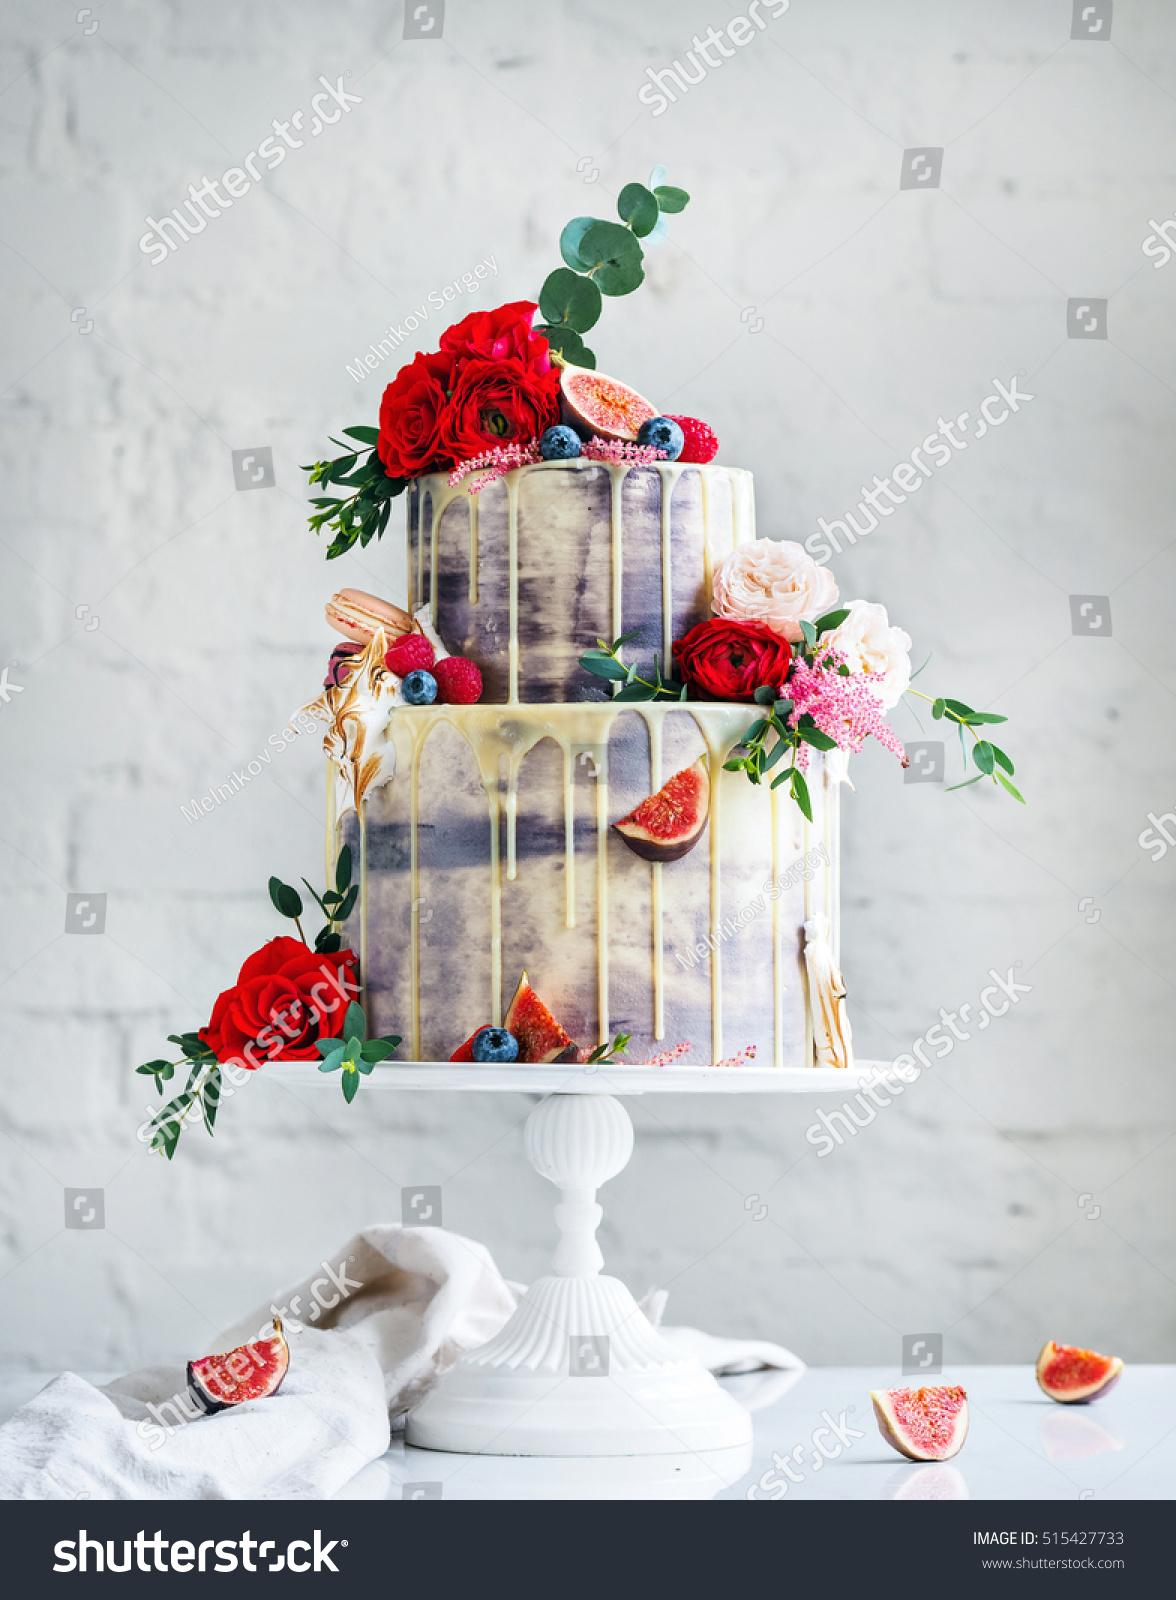 Wedding Cake Flowers Figs Macarons Blueberries Stock Photo (Royalty ...